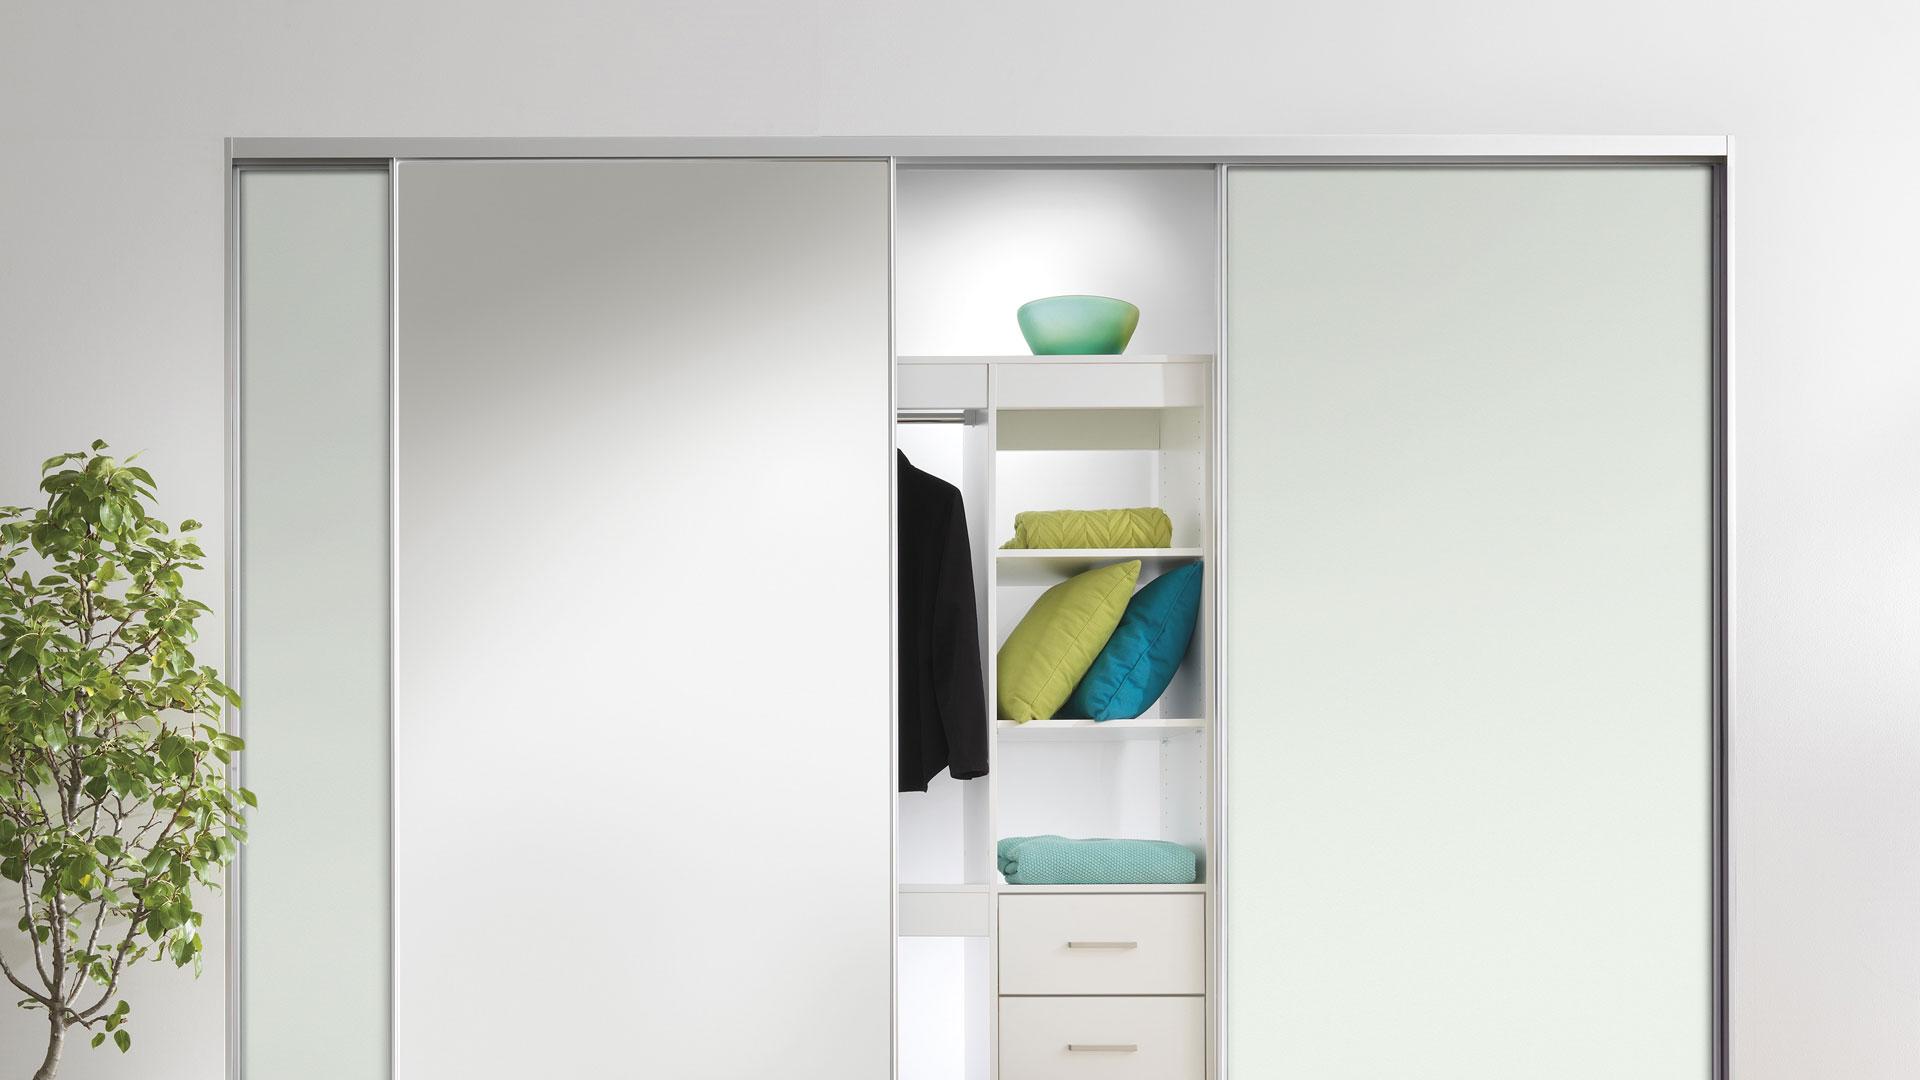 Deco Trim wardrobe door system